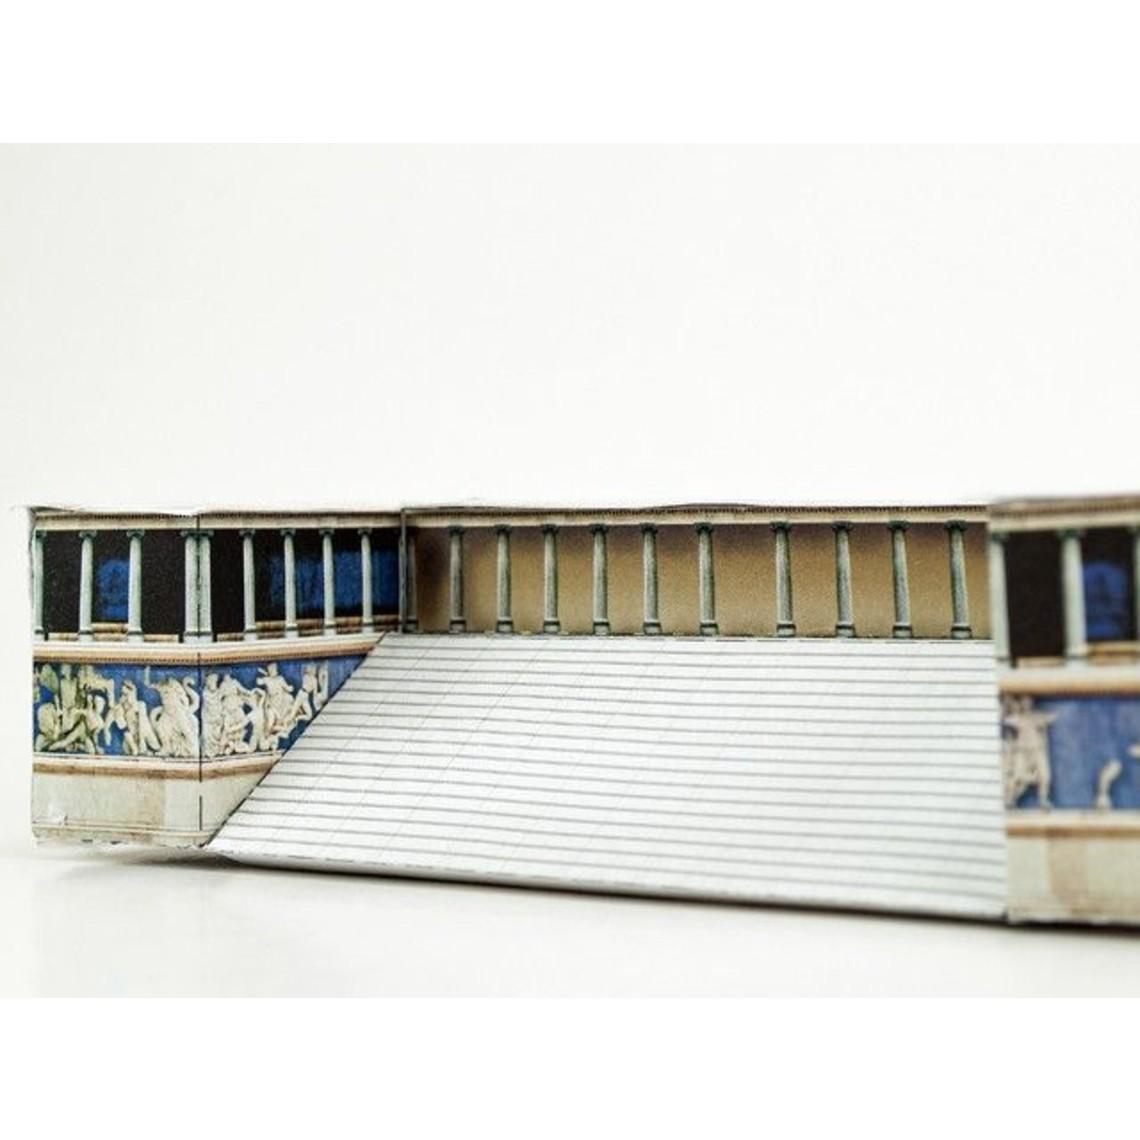 Modell byggsats Pergamon